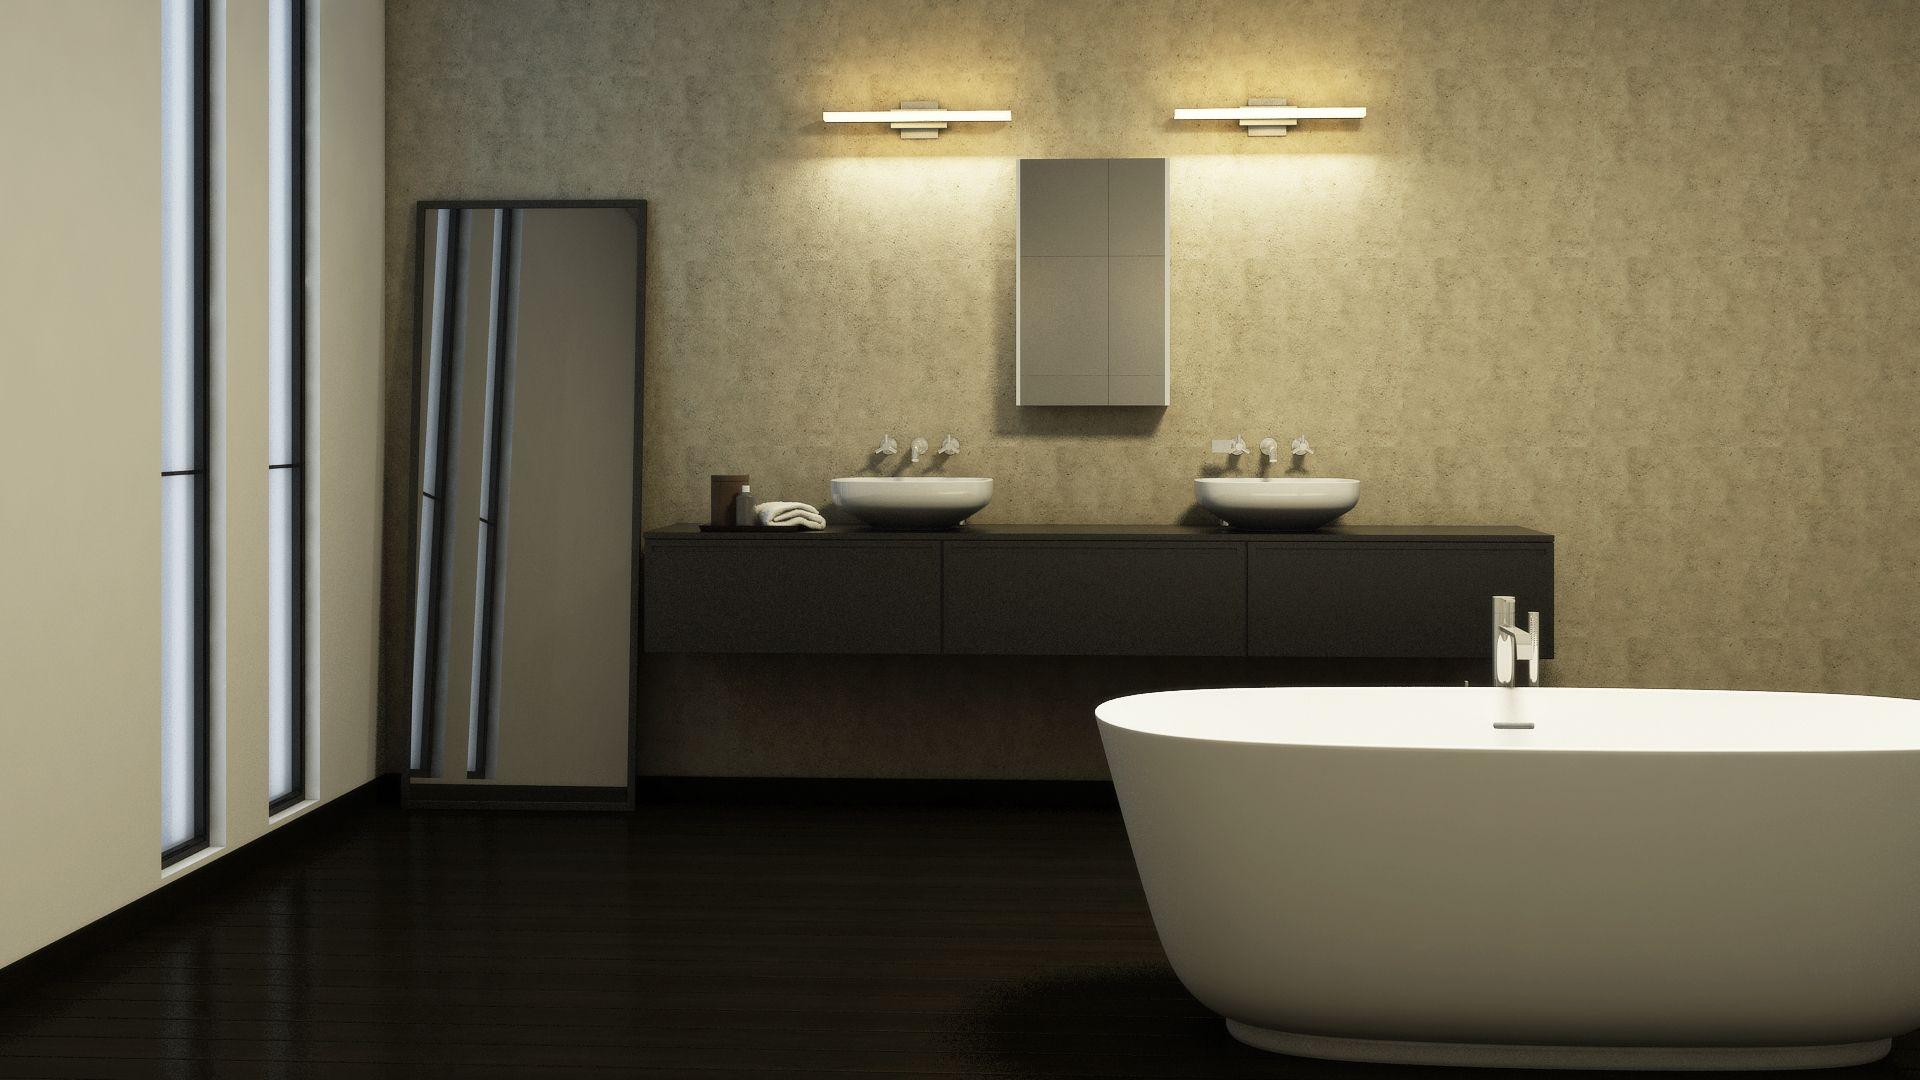 Procyon 18w led bathroom lighting fixture vonn lighting led procyon 18w led bathroom lighting fixture arubaitofo Image collections